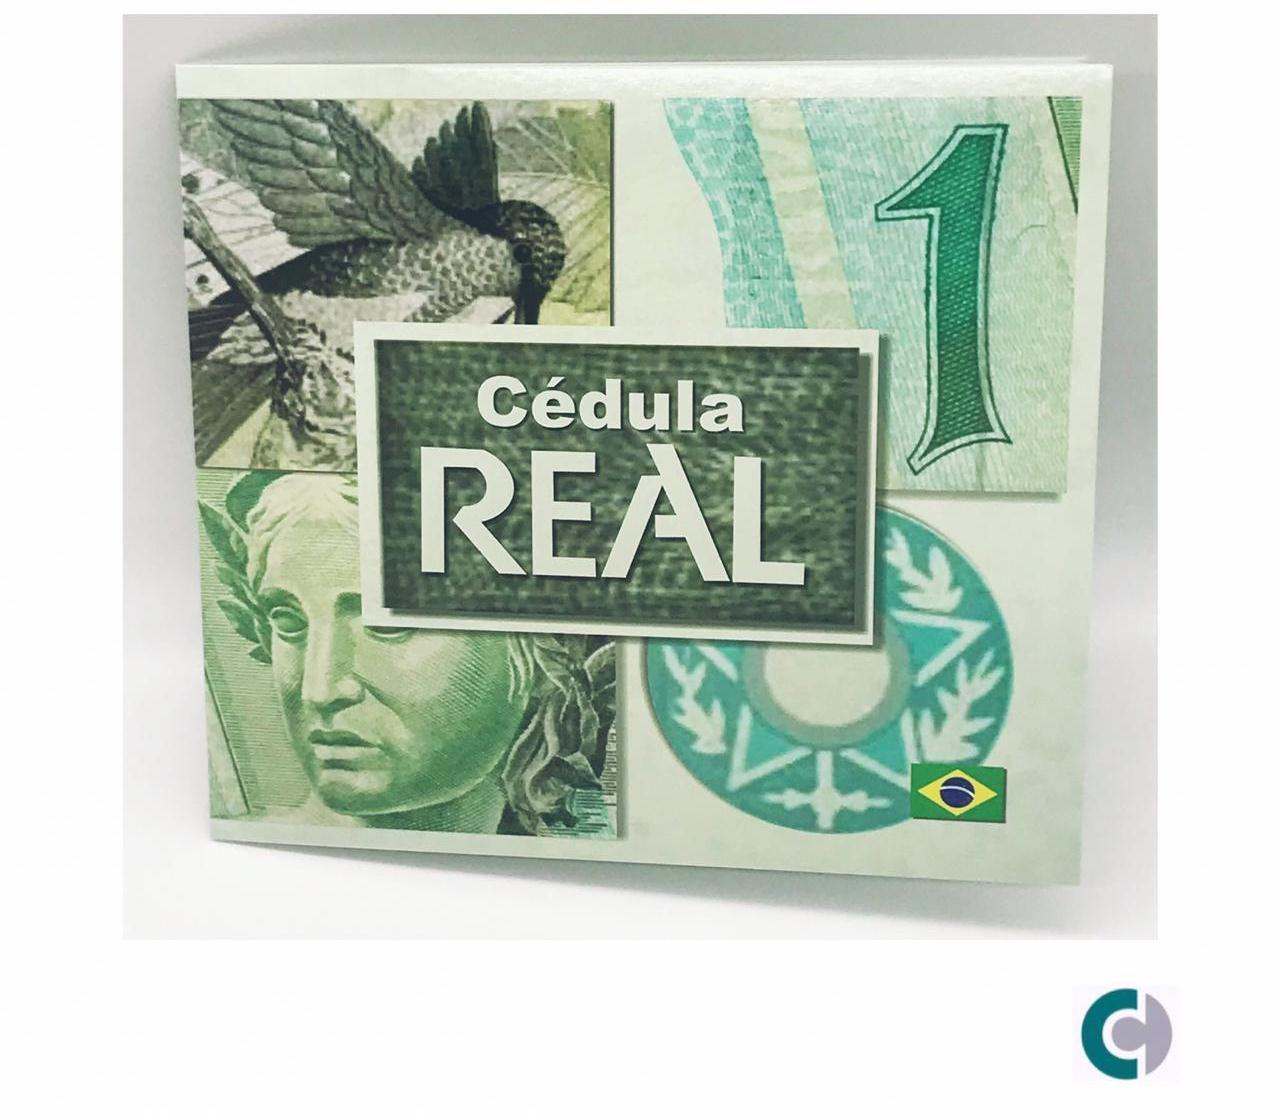 FOLDER COM CÉDULA DE 1 REAL